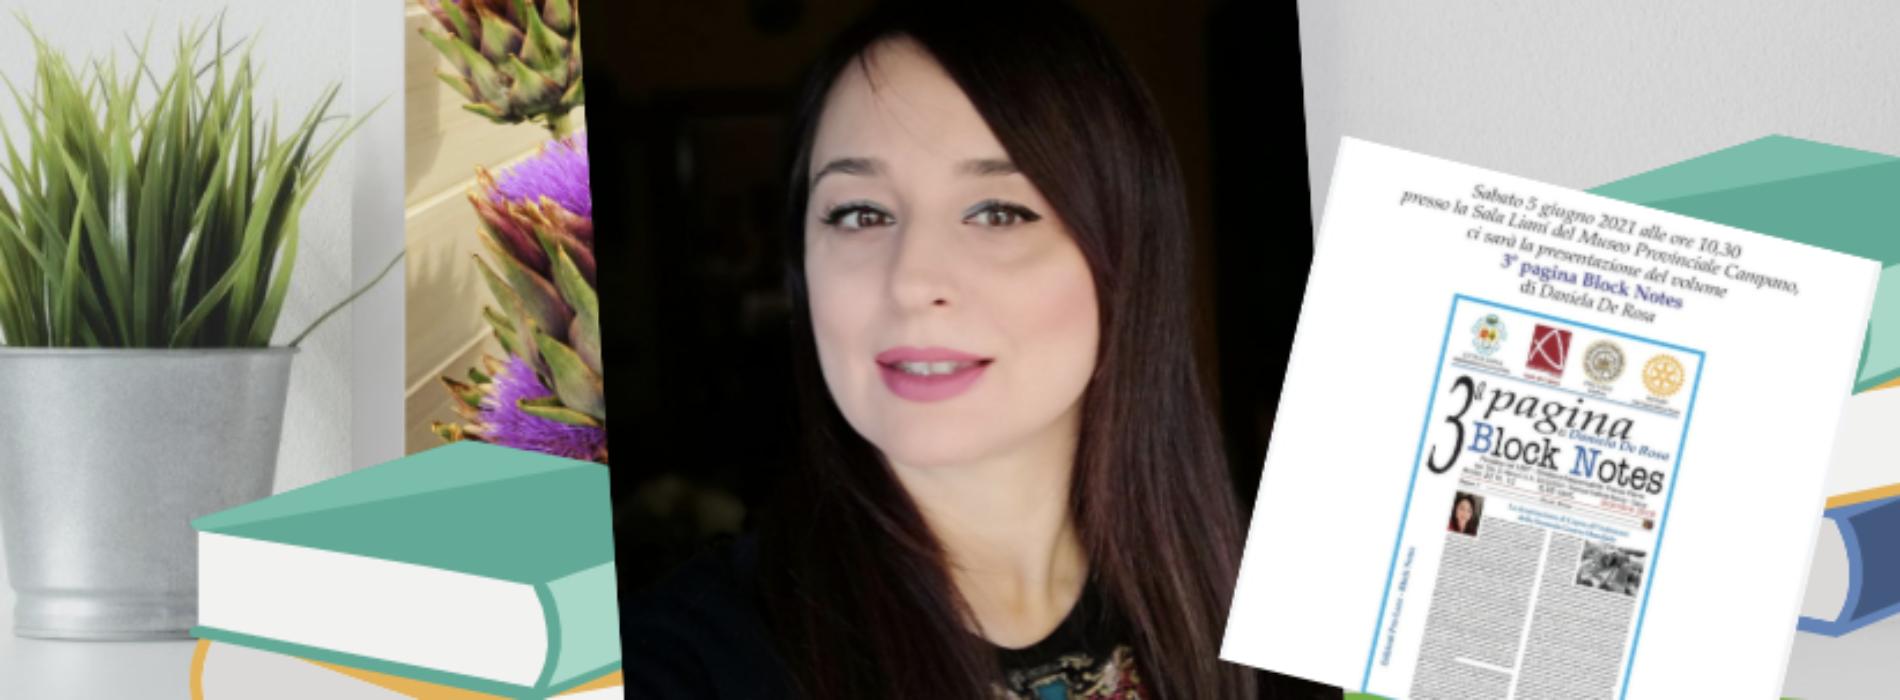 Capua va in terza pagina, la guida insolita di Daniela De Rosa